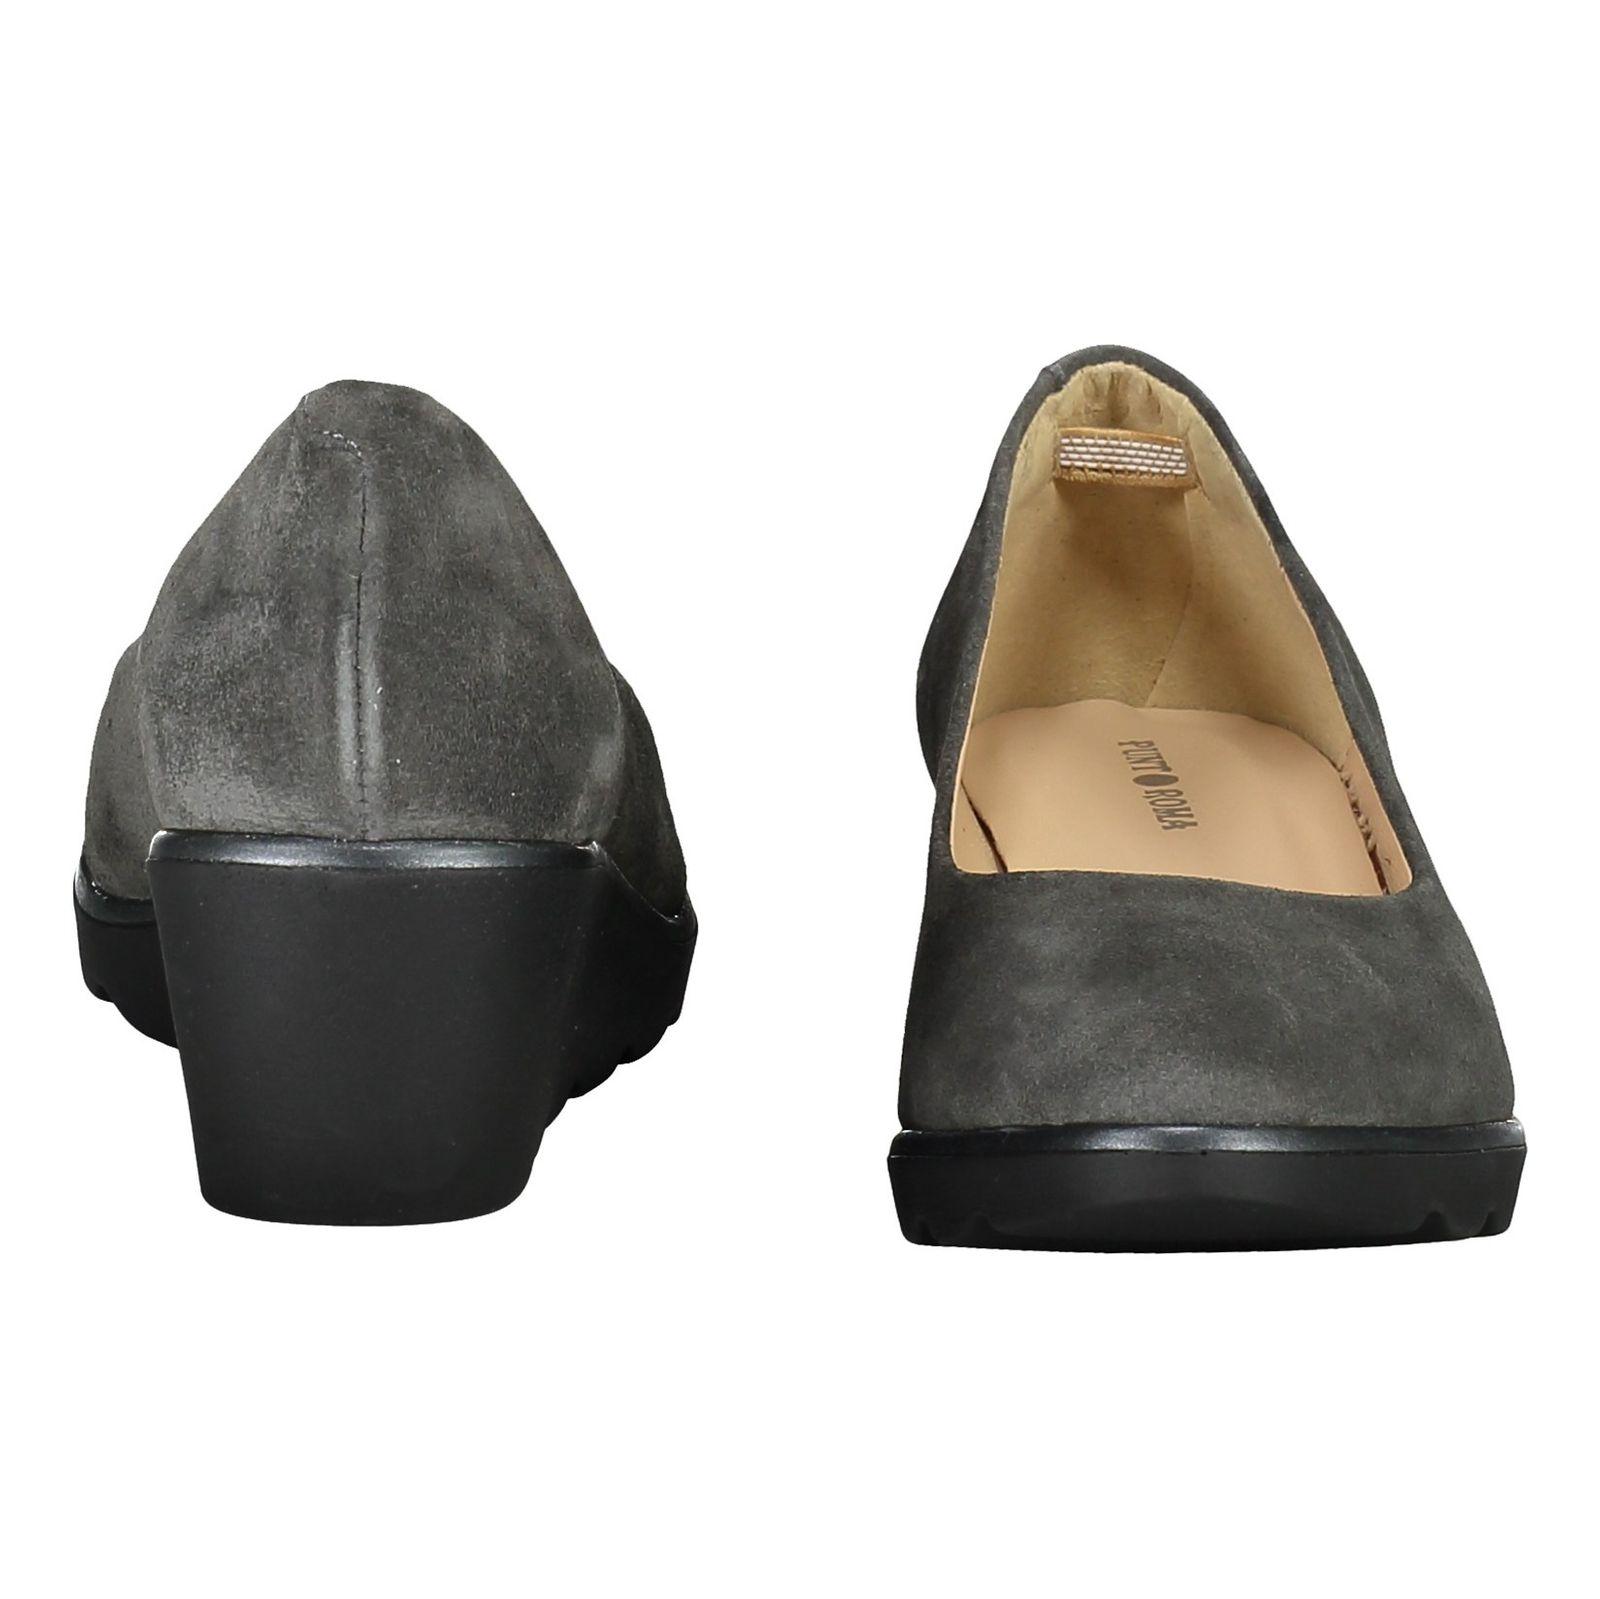 کفش جیر لژ دار چرم زنانه - پونت روما - طوسي - 5